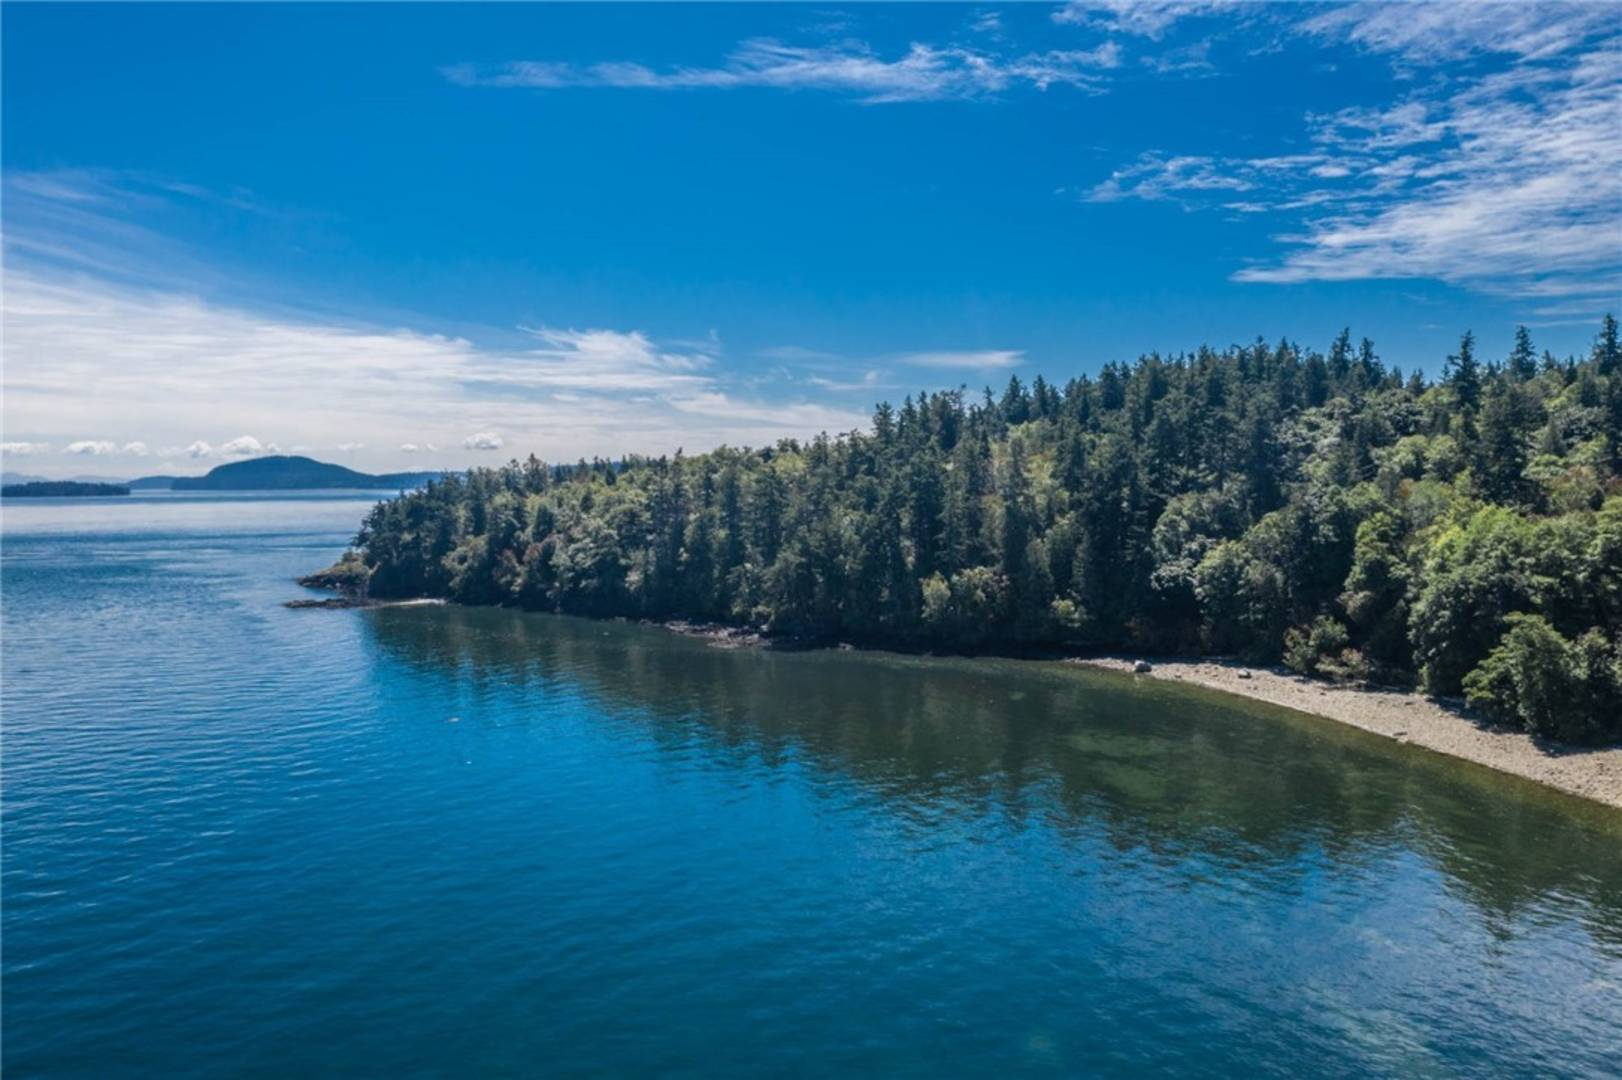 46396 Sinclair Island, Sinclair Island, WA 98221